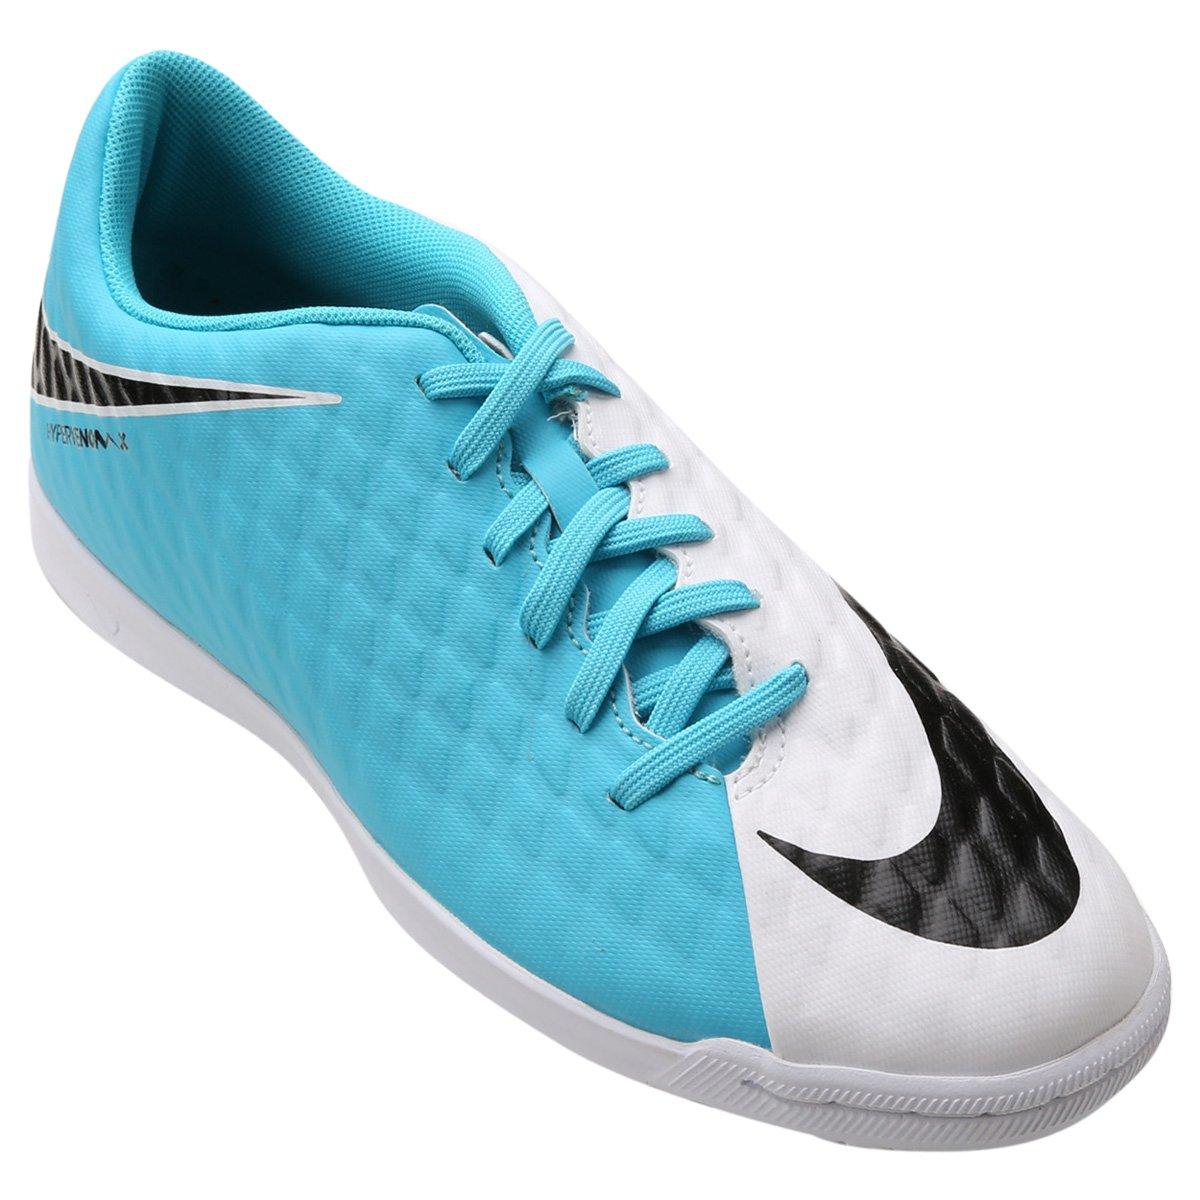 0db45d25fe75a Chuteira Futsal Nike Hypervenom Phade 3 IC - Compre Agora